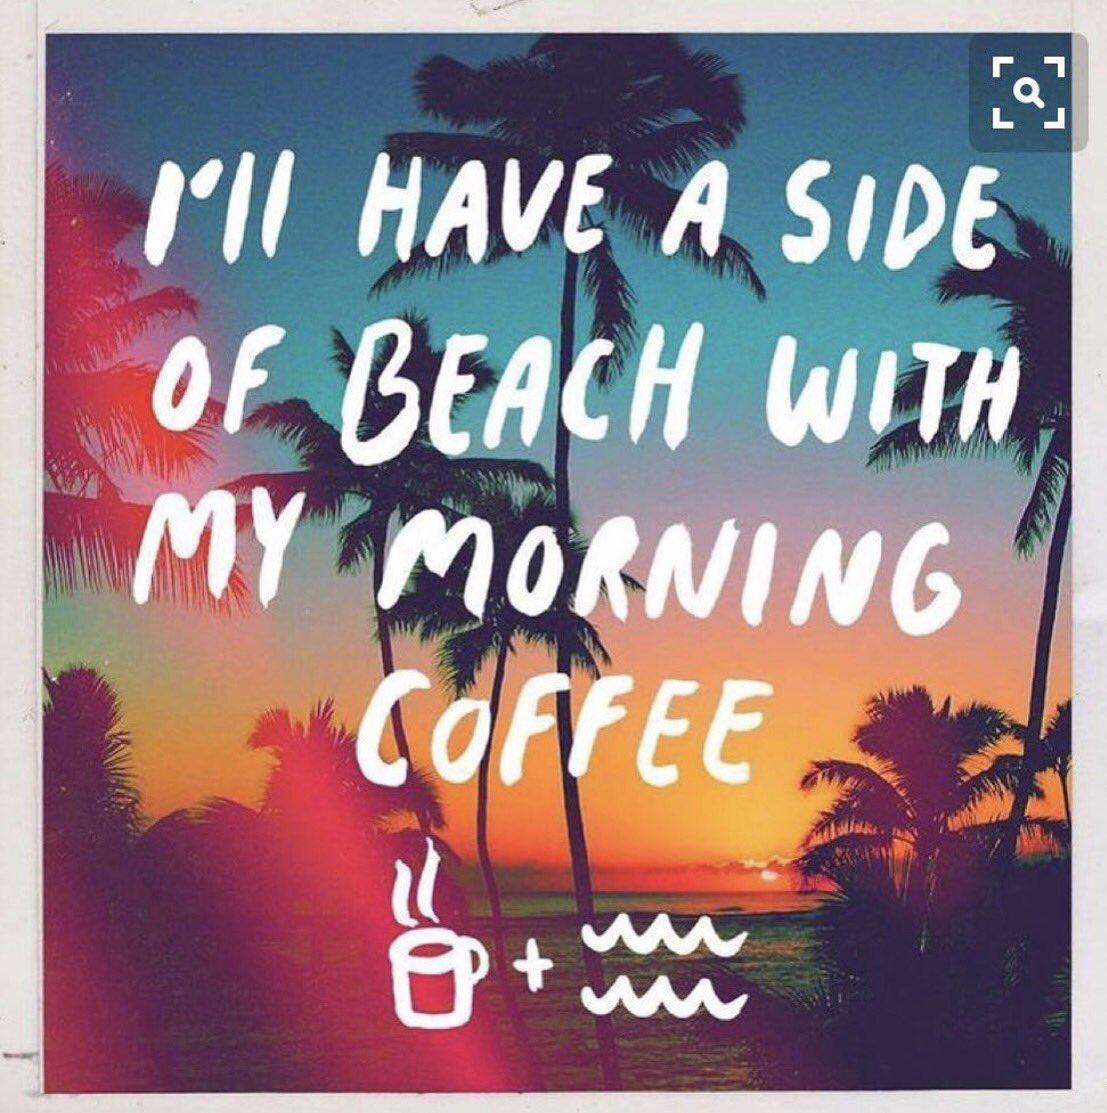 Yes or No? #beach #ocean <br>http://pic.twitter.com/t6U7vftNn0